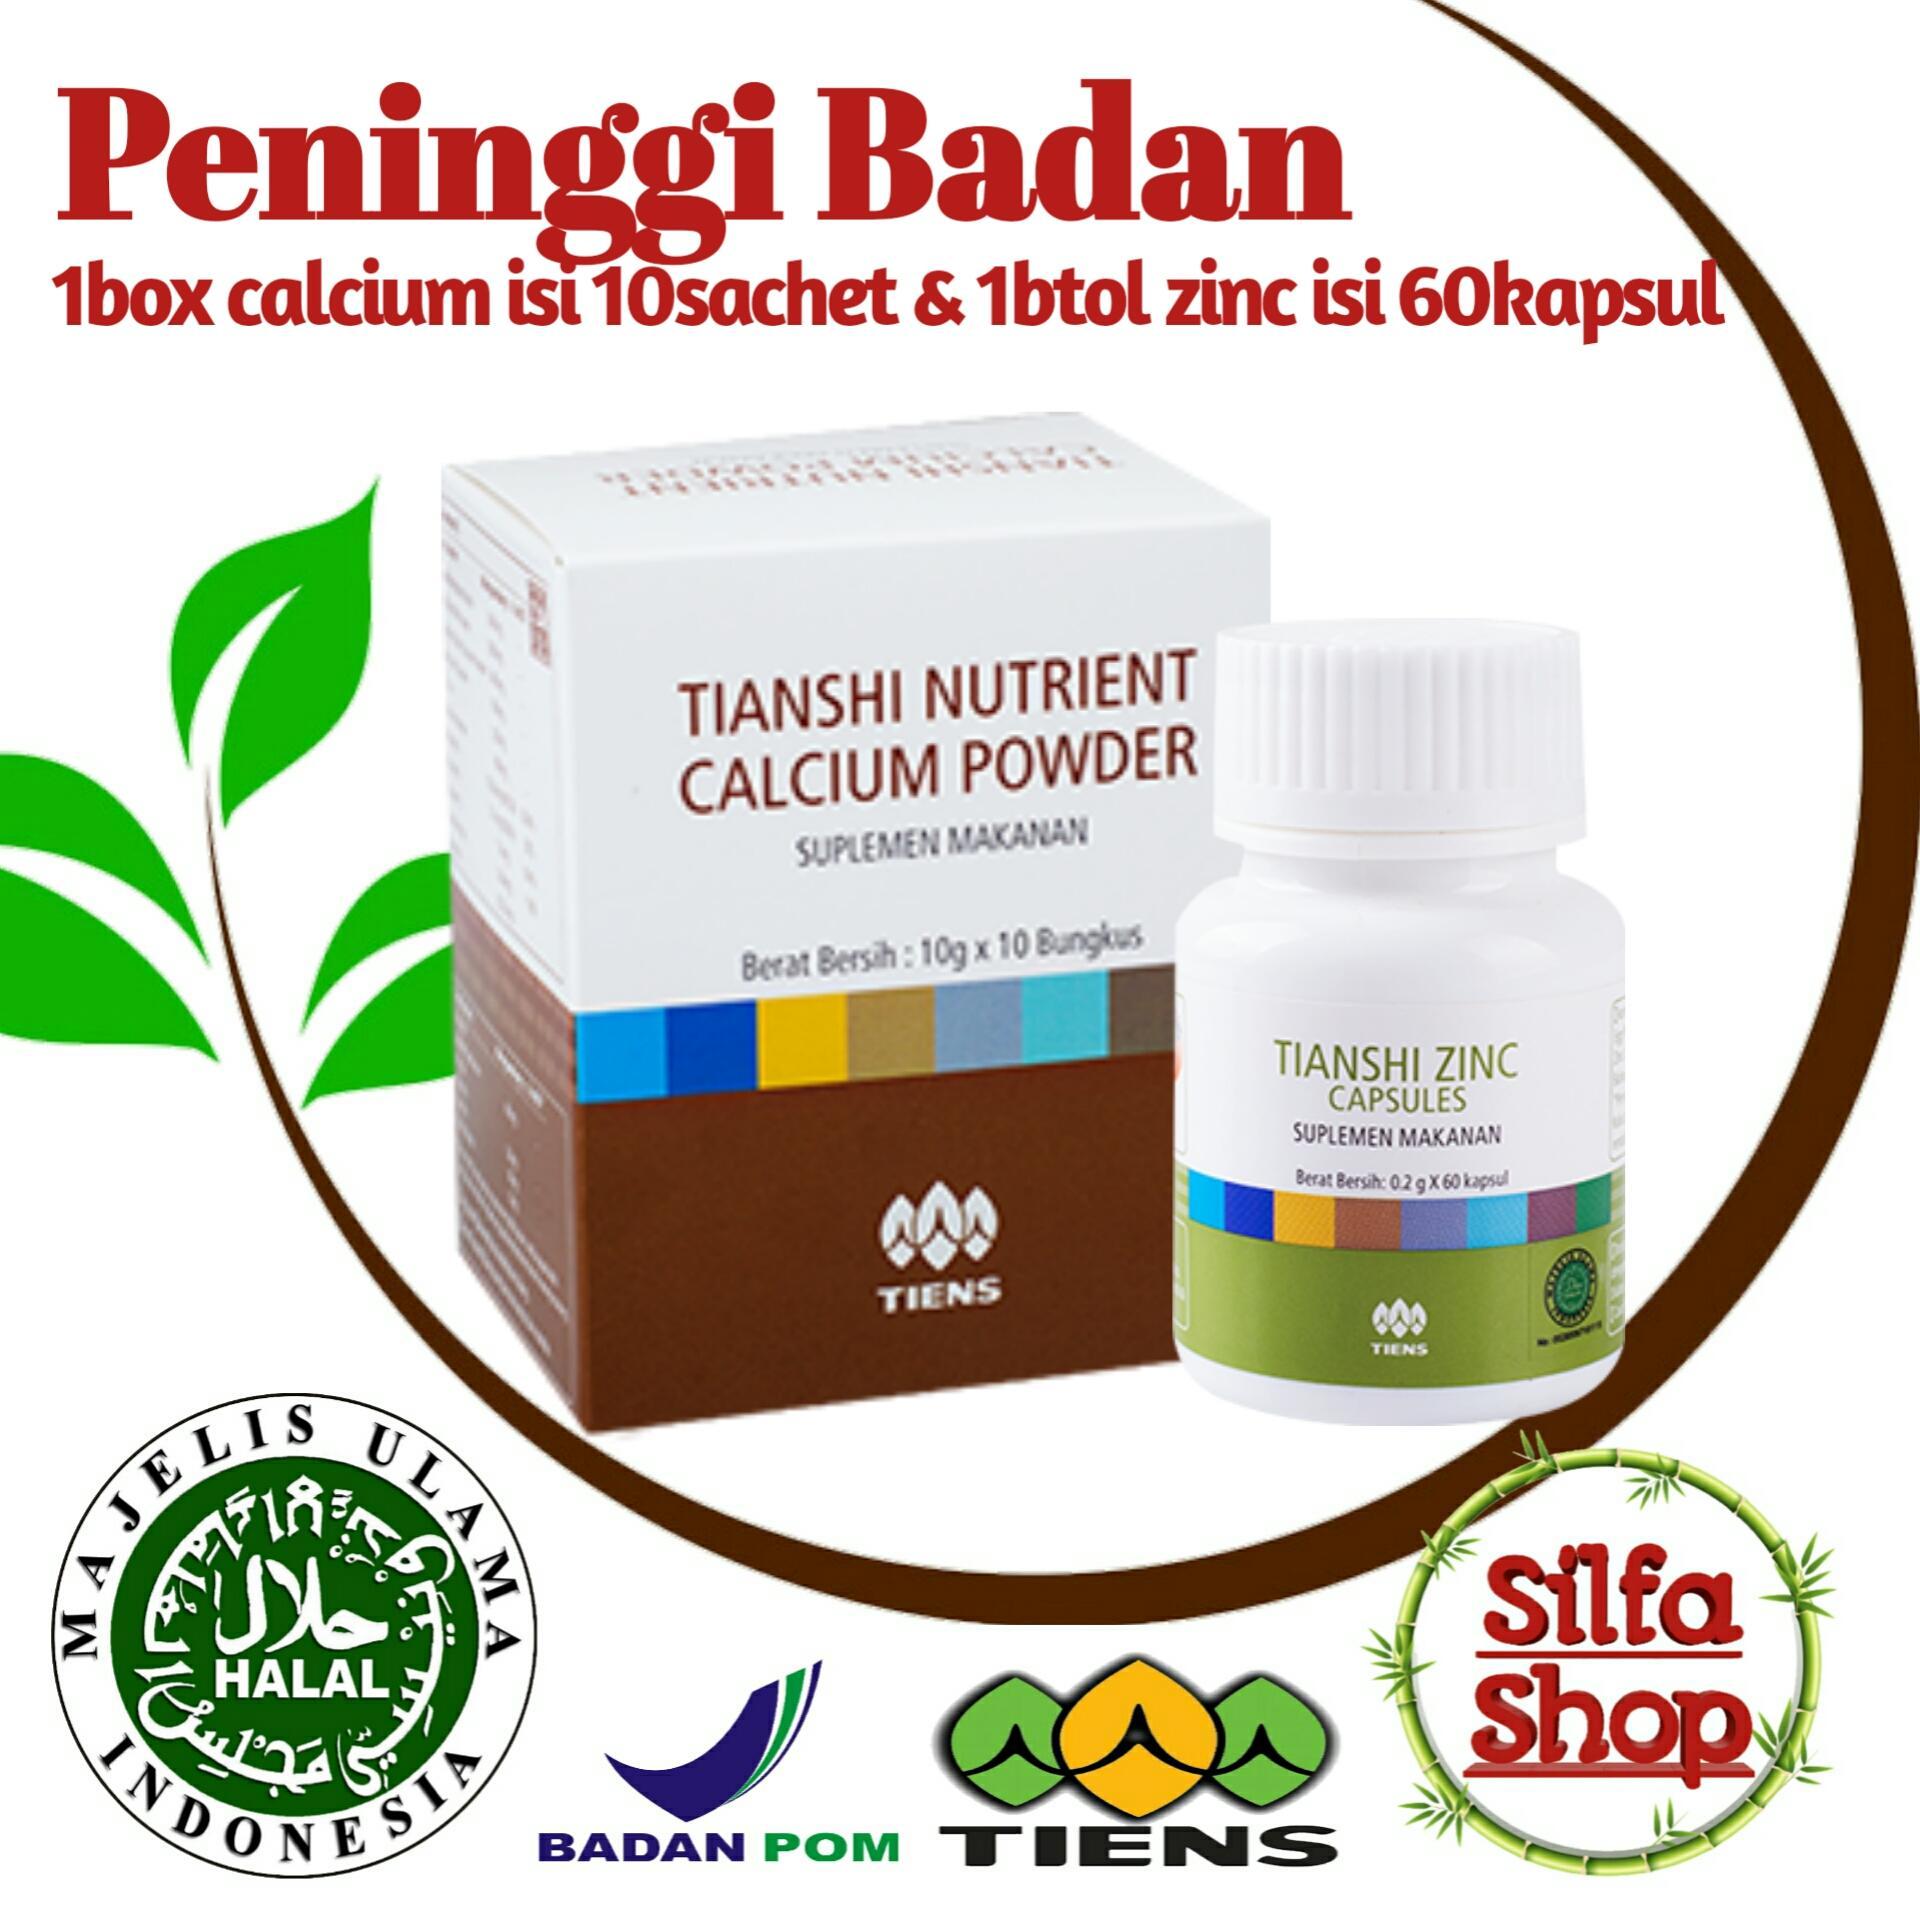 Promo Ramadhan Termurah Peninggi badan Tiens asli manjur produk nomer1 dunia Nutrient high kalsium dan Zinc Capsules By Silfa Shop